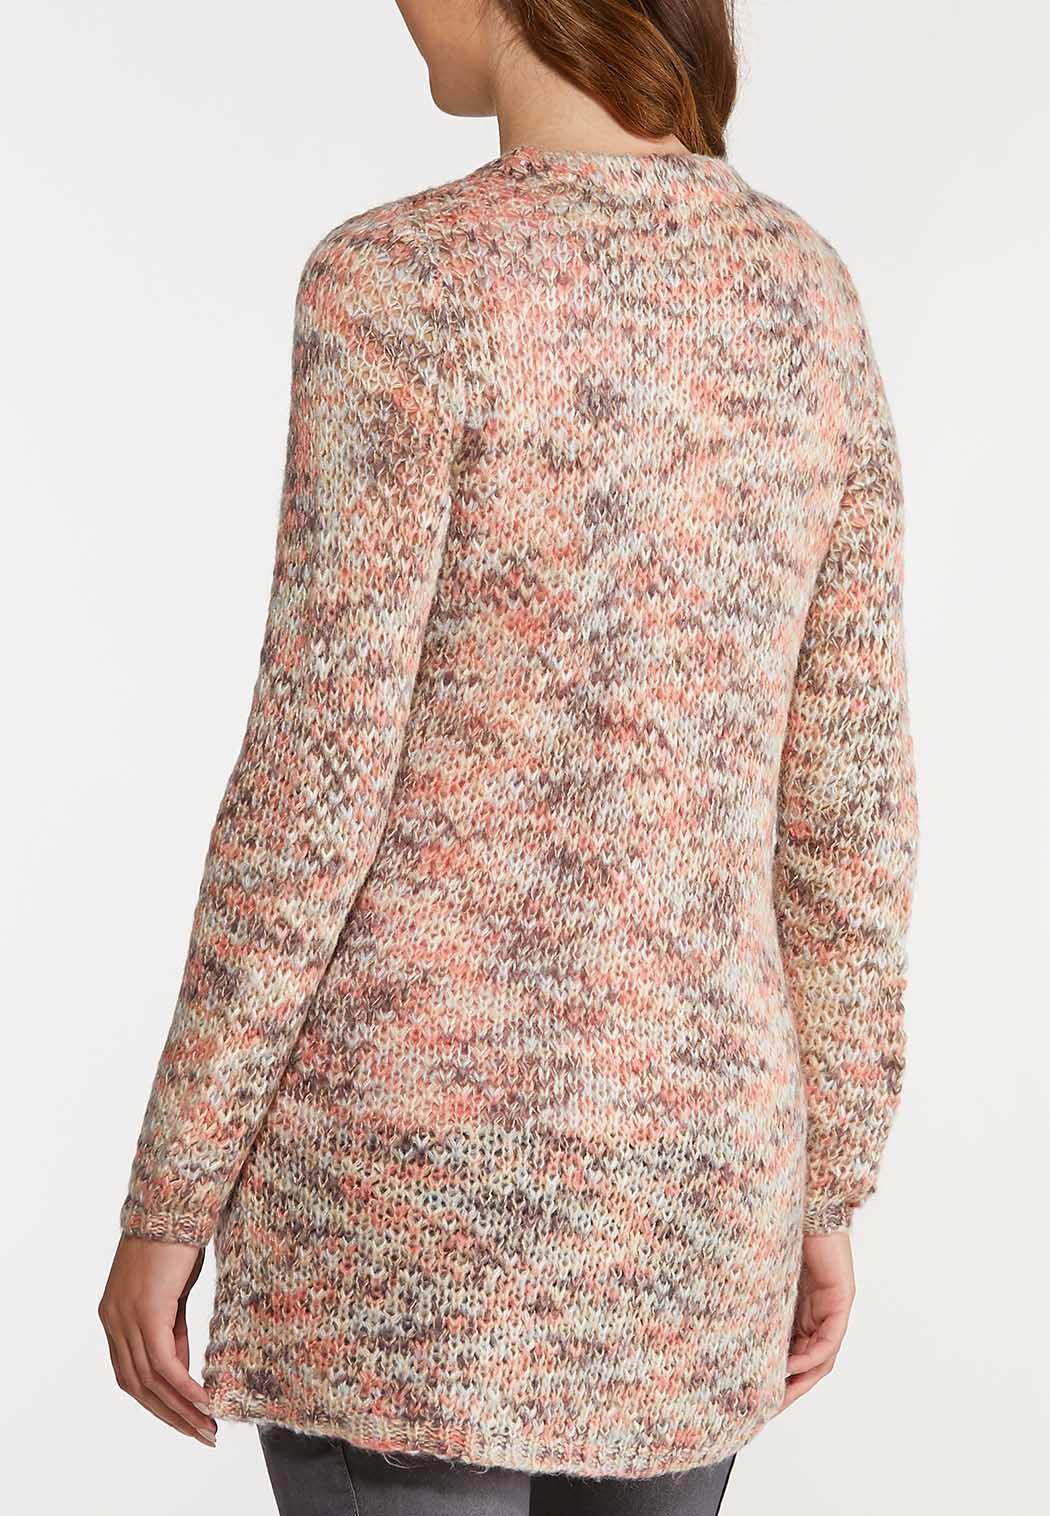 Berry Sweet Cardigan Sweater (Item #44067747)